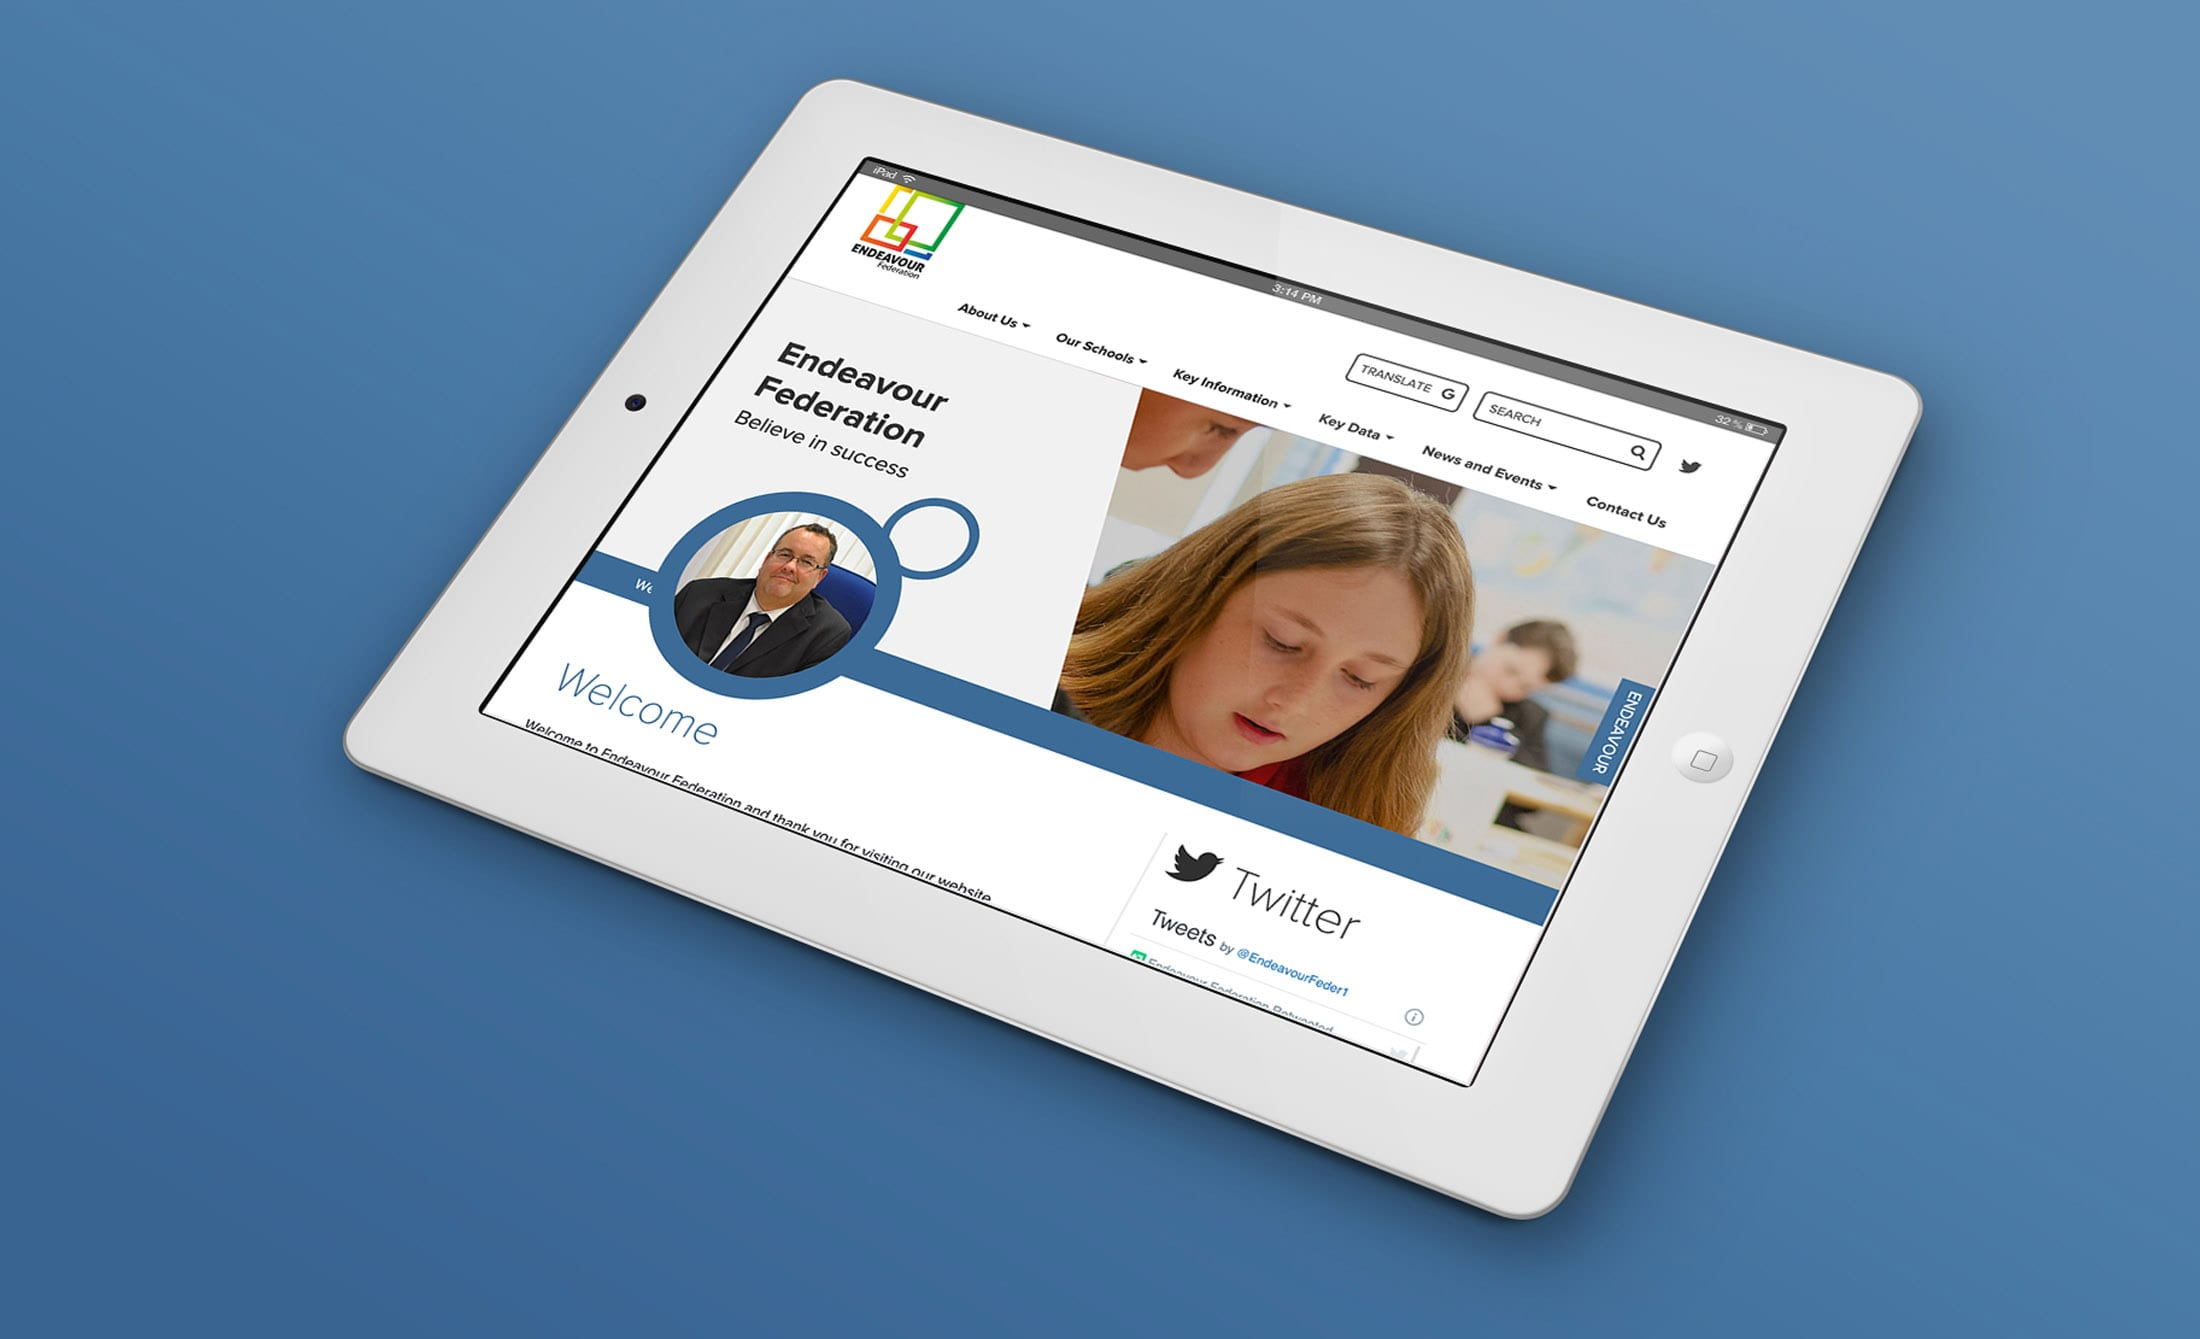 Website design for Endeavour Federation, Manchester